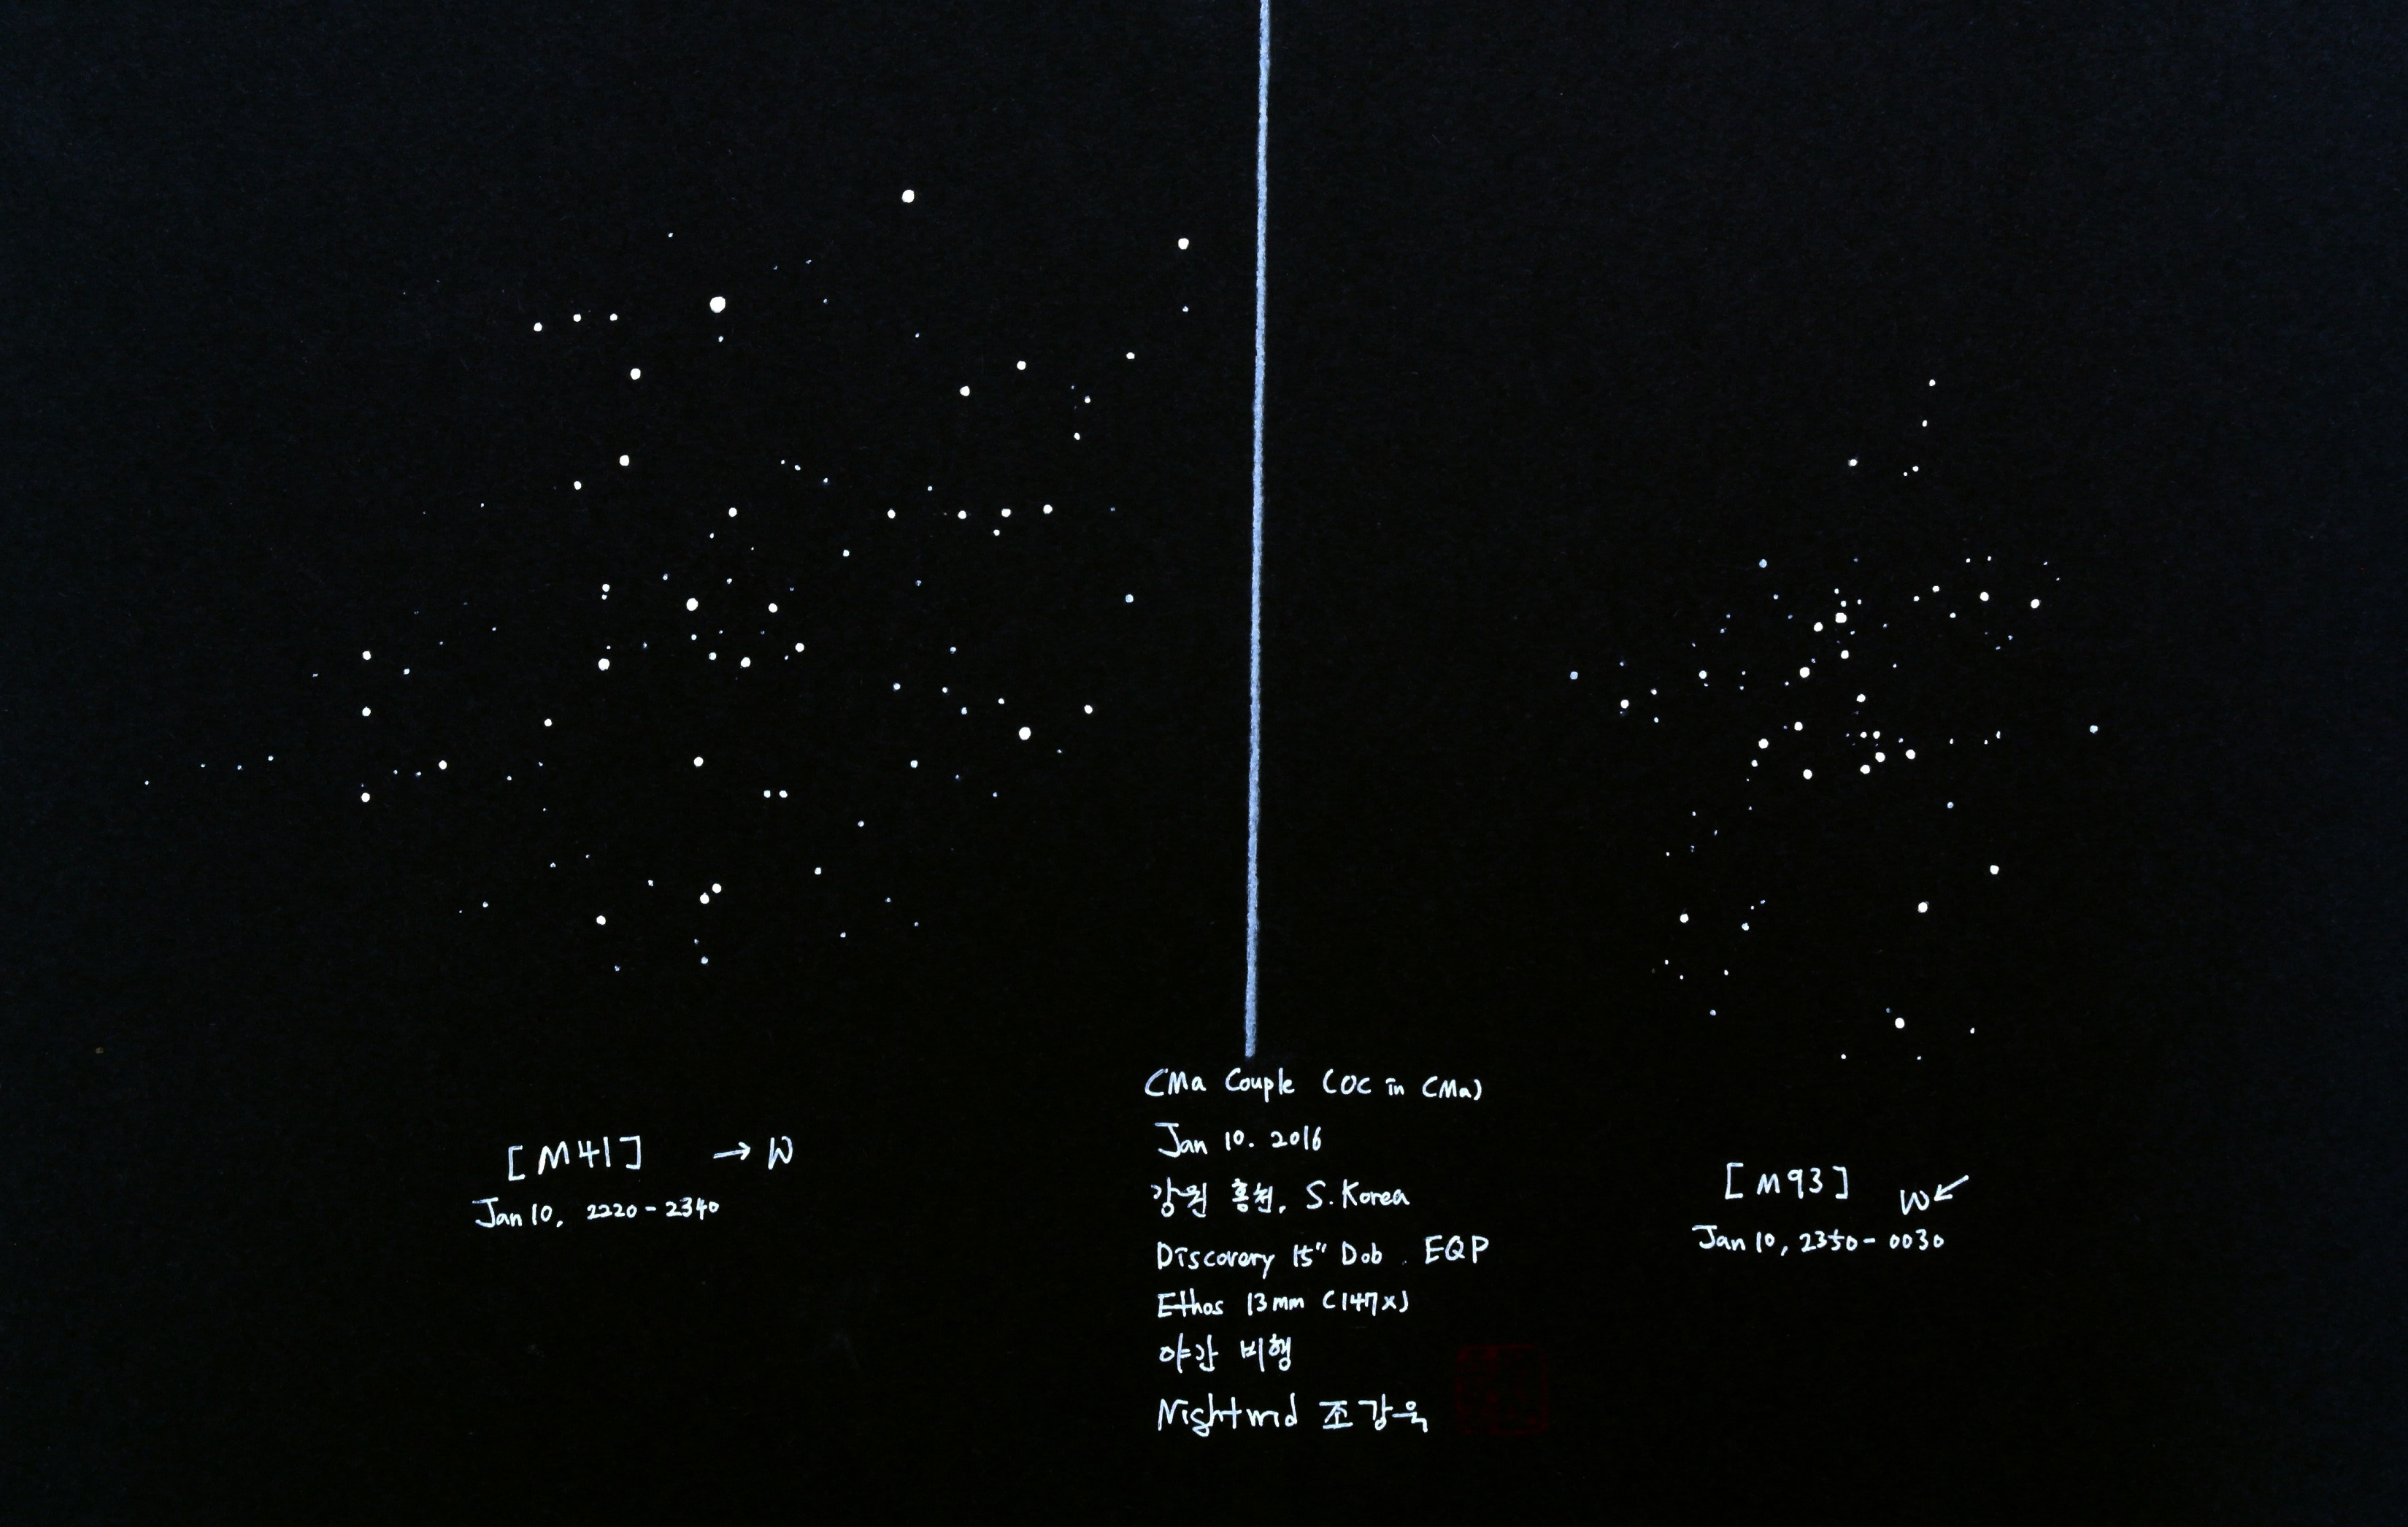 M41_93.JPG